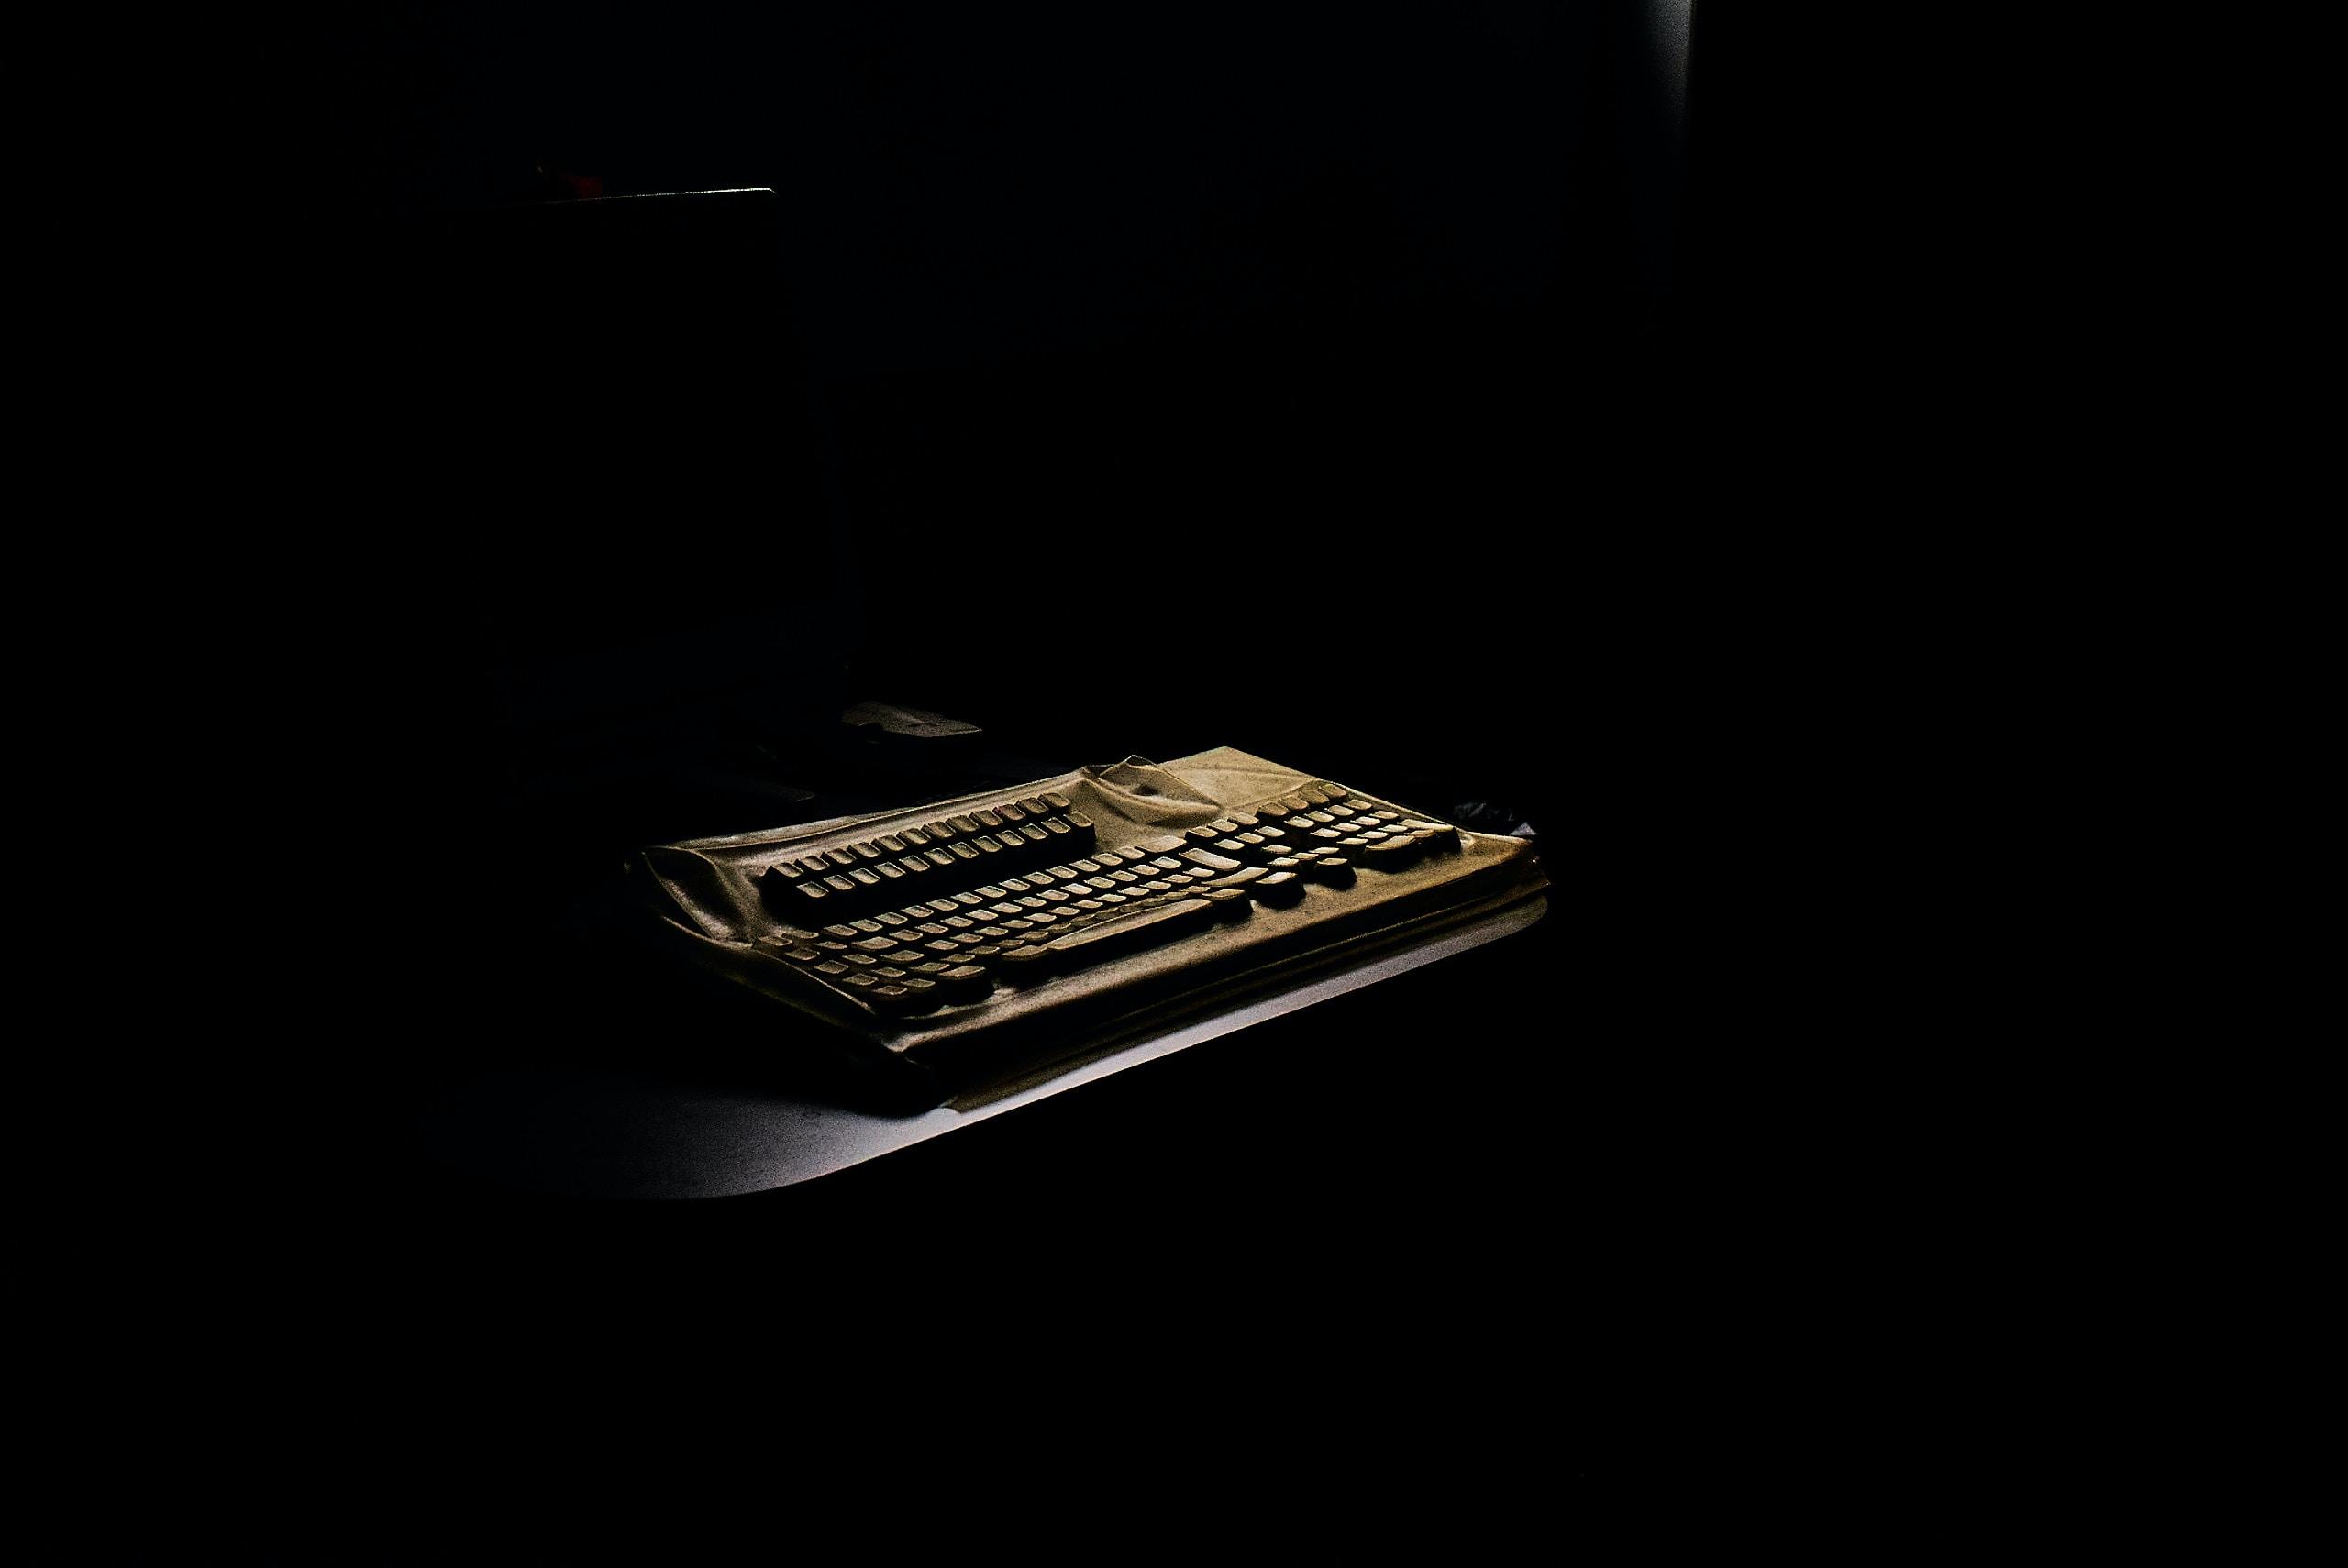 black and brown keyboard